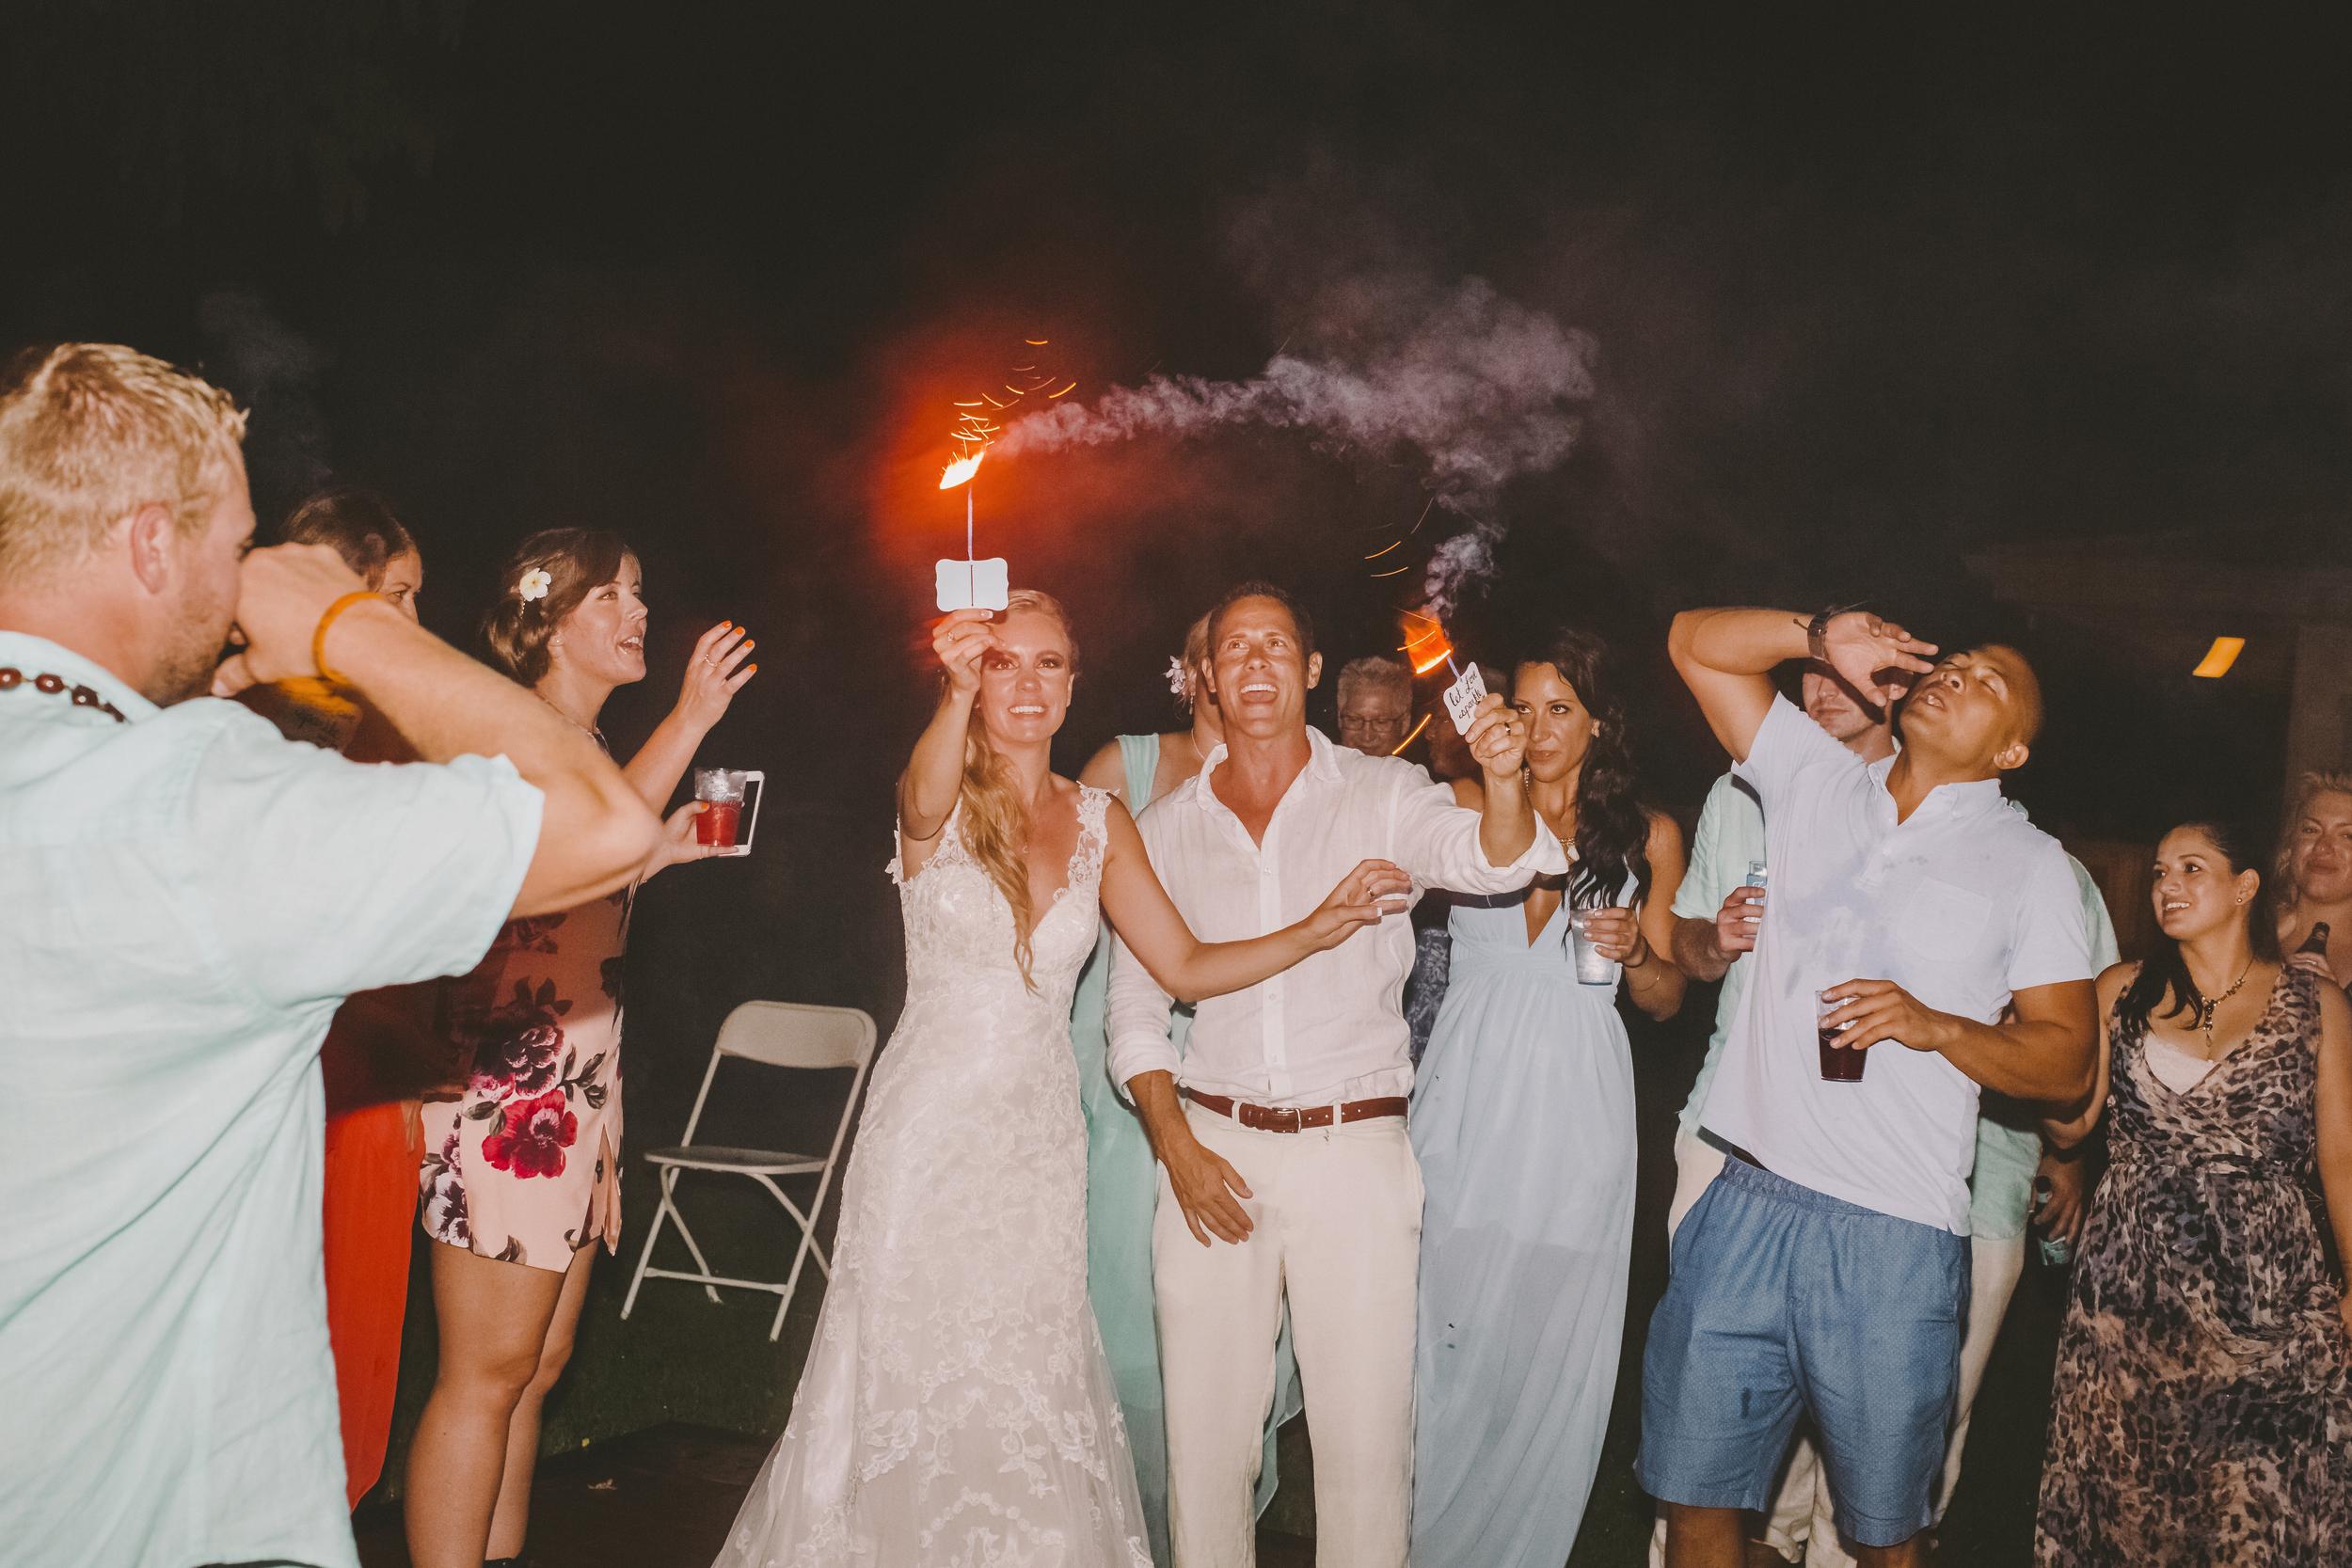 angie-diaz-photography-hawaii-wedding-photographer-kelli-jay-140.jpg